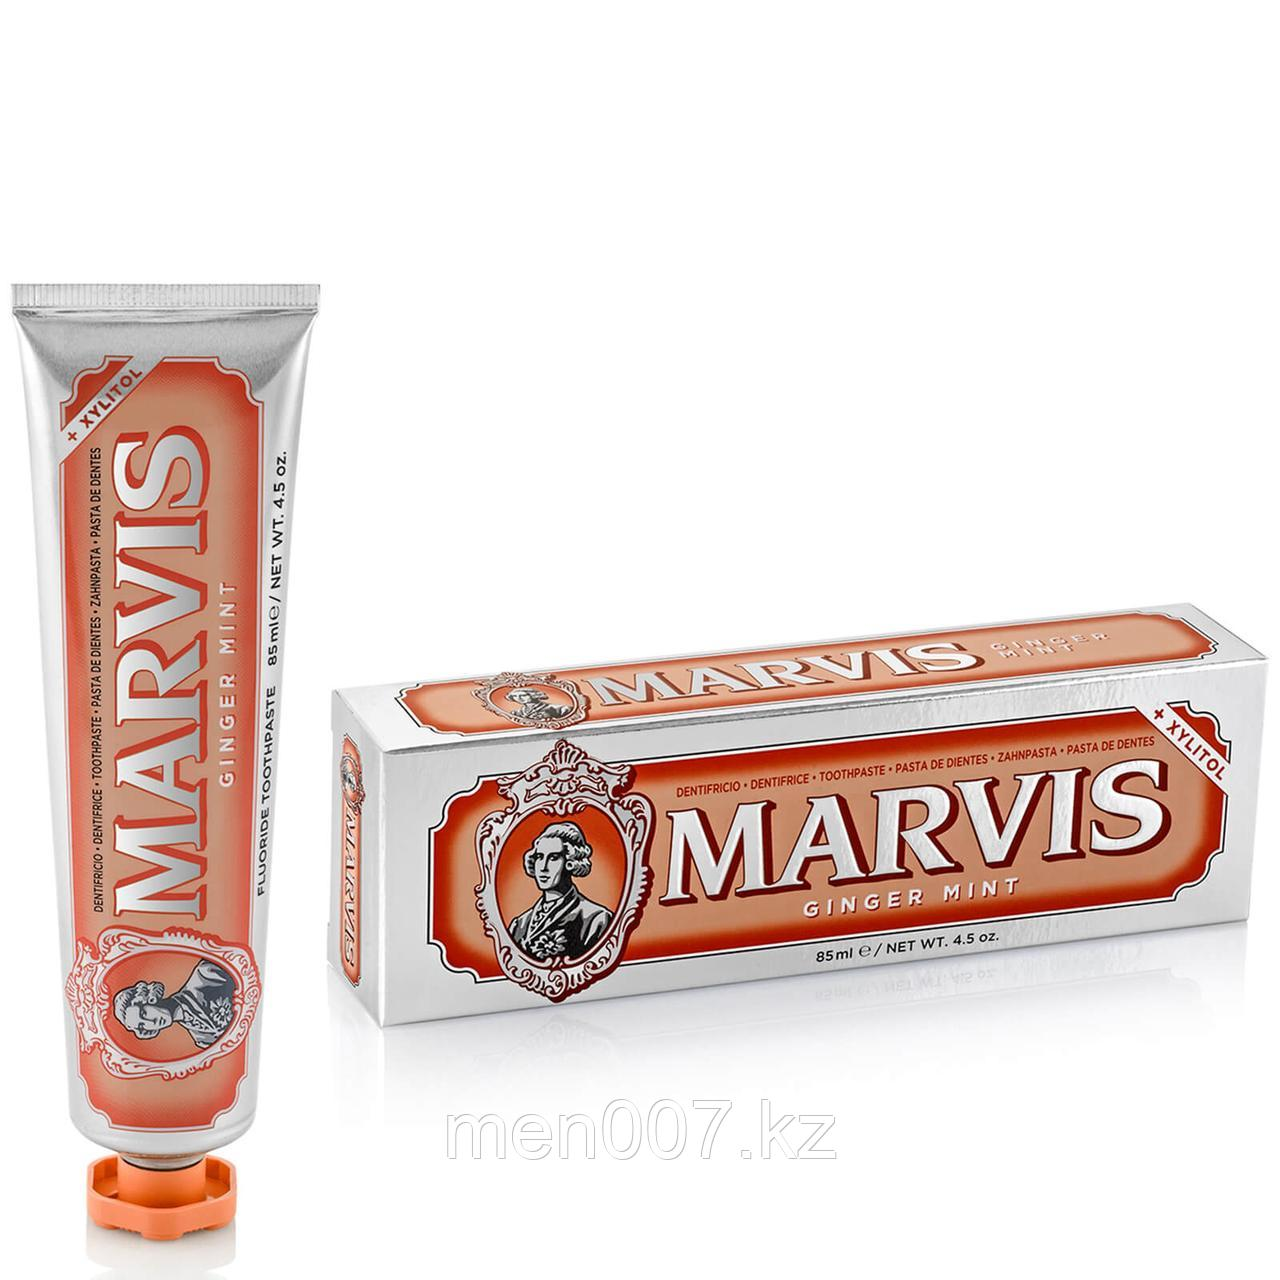 Marvis зубная паста Ginger Mint (вкус: мята + имбирь) 85 мл